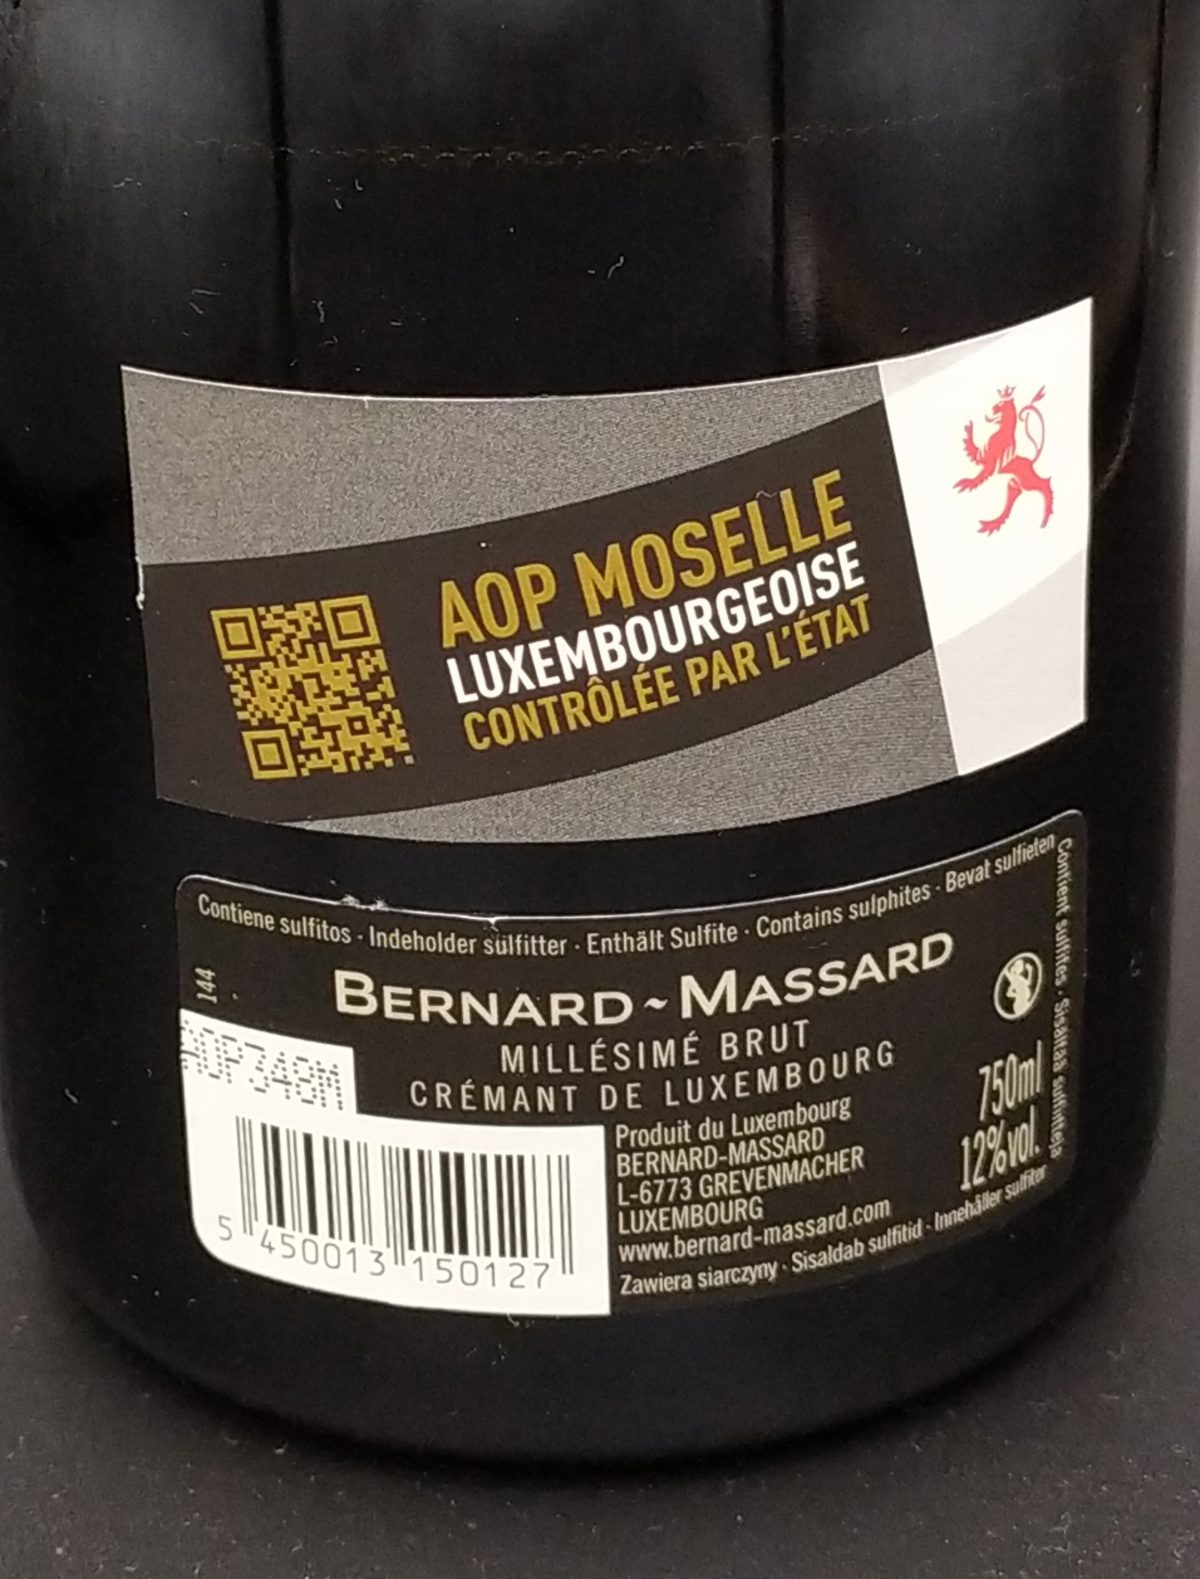 Crémant Millesimè Brut 2016 Bernard-Massard - etichetta AOP